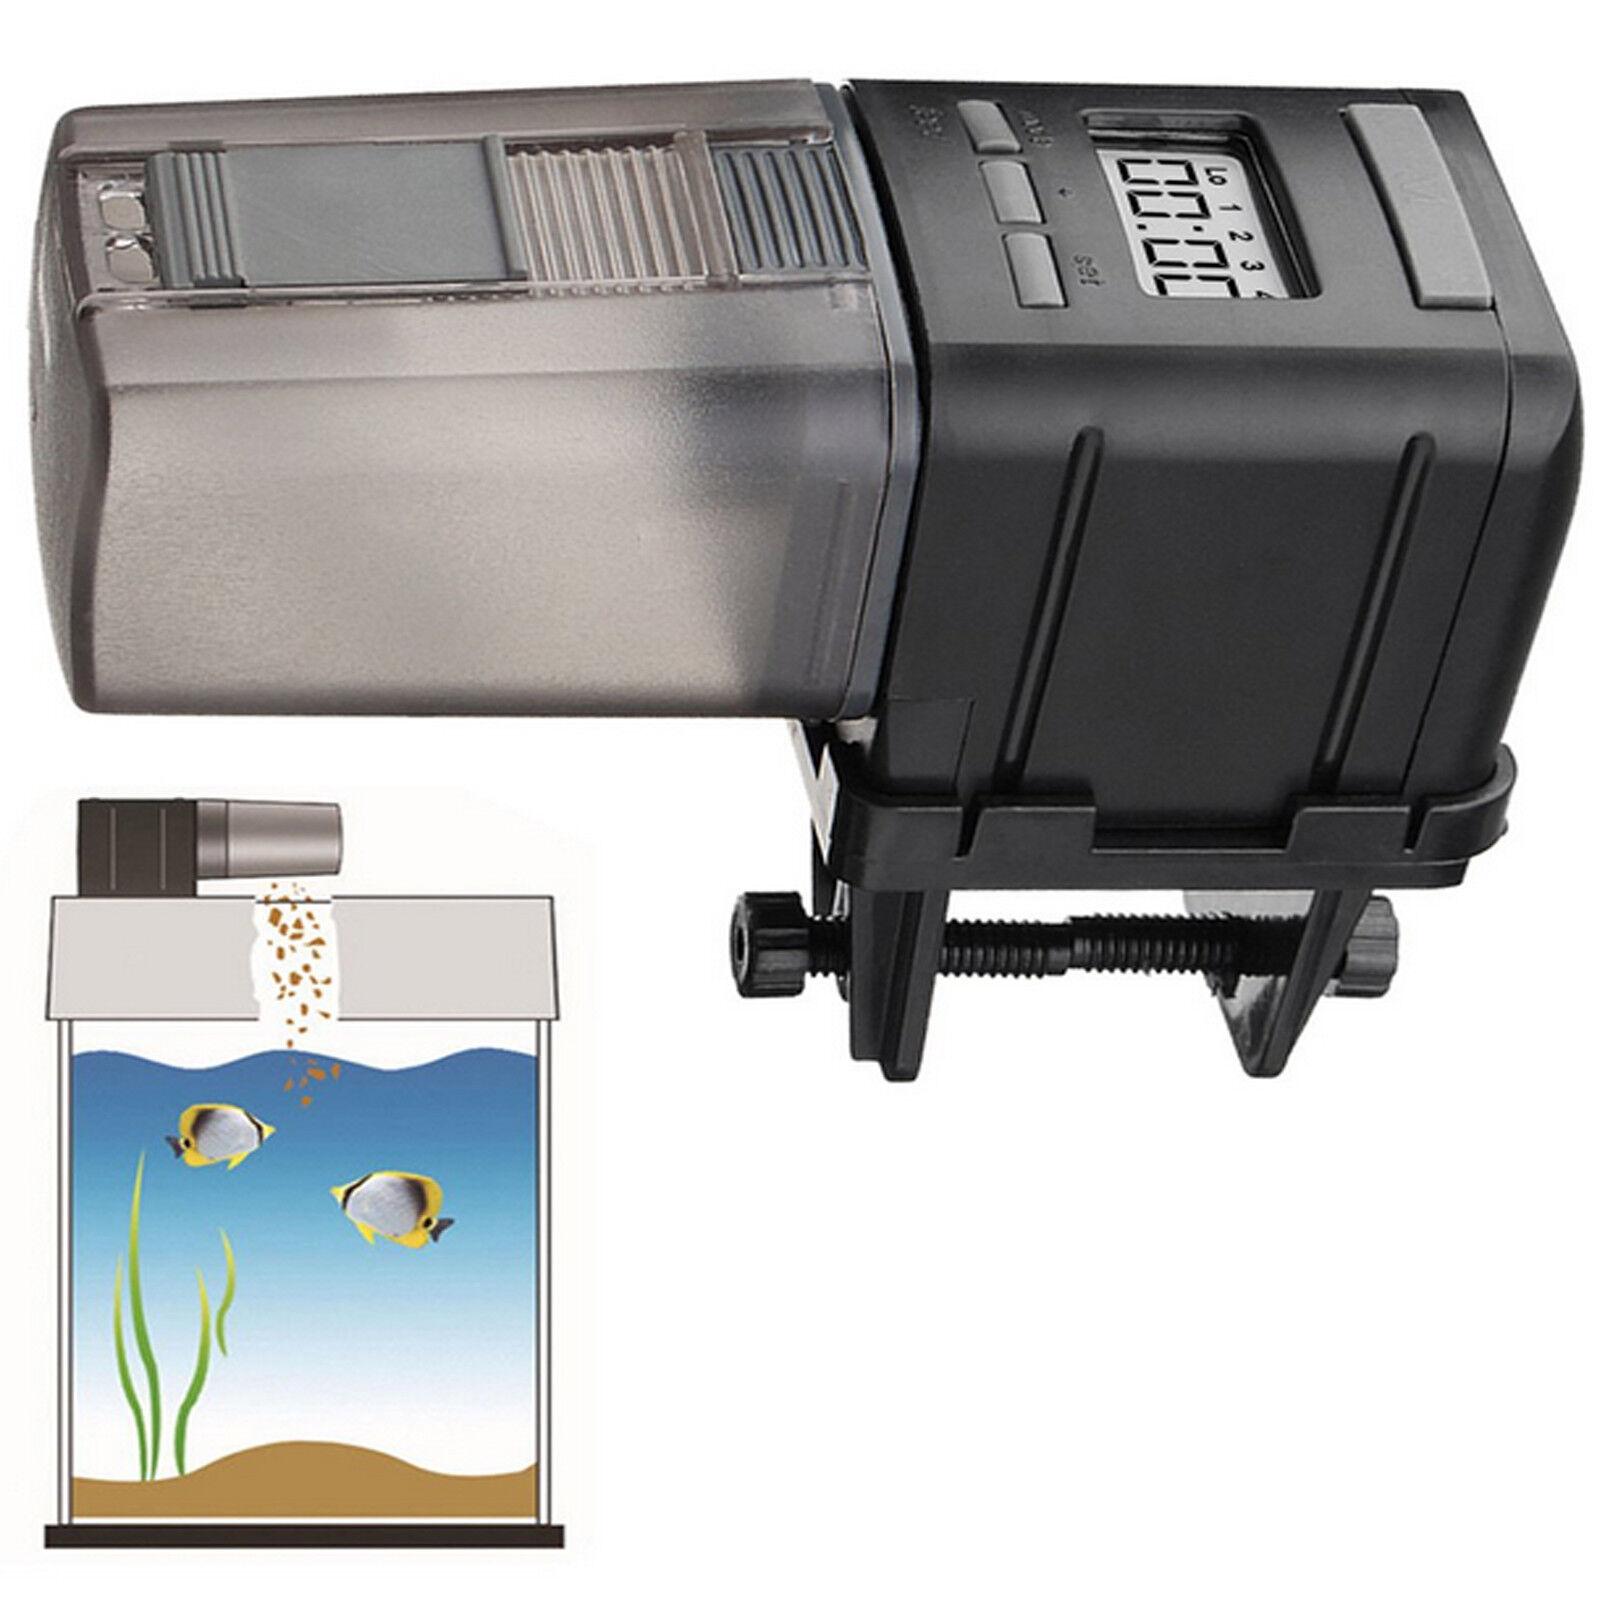 Intelligent Fischfutterautomaten Mini Automatisch Fisch Futterautomat Aquarium